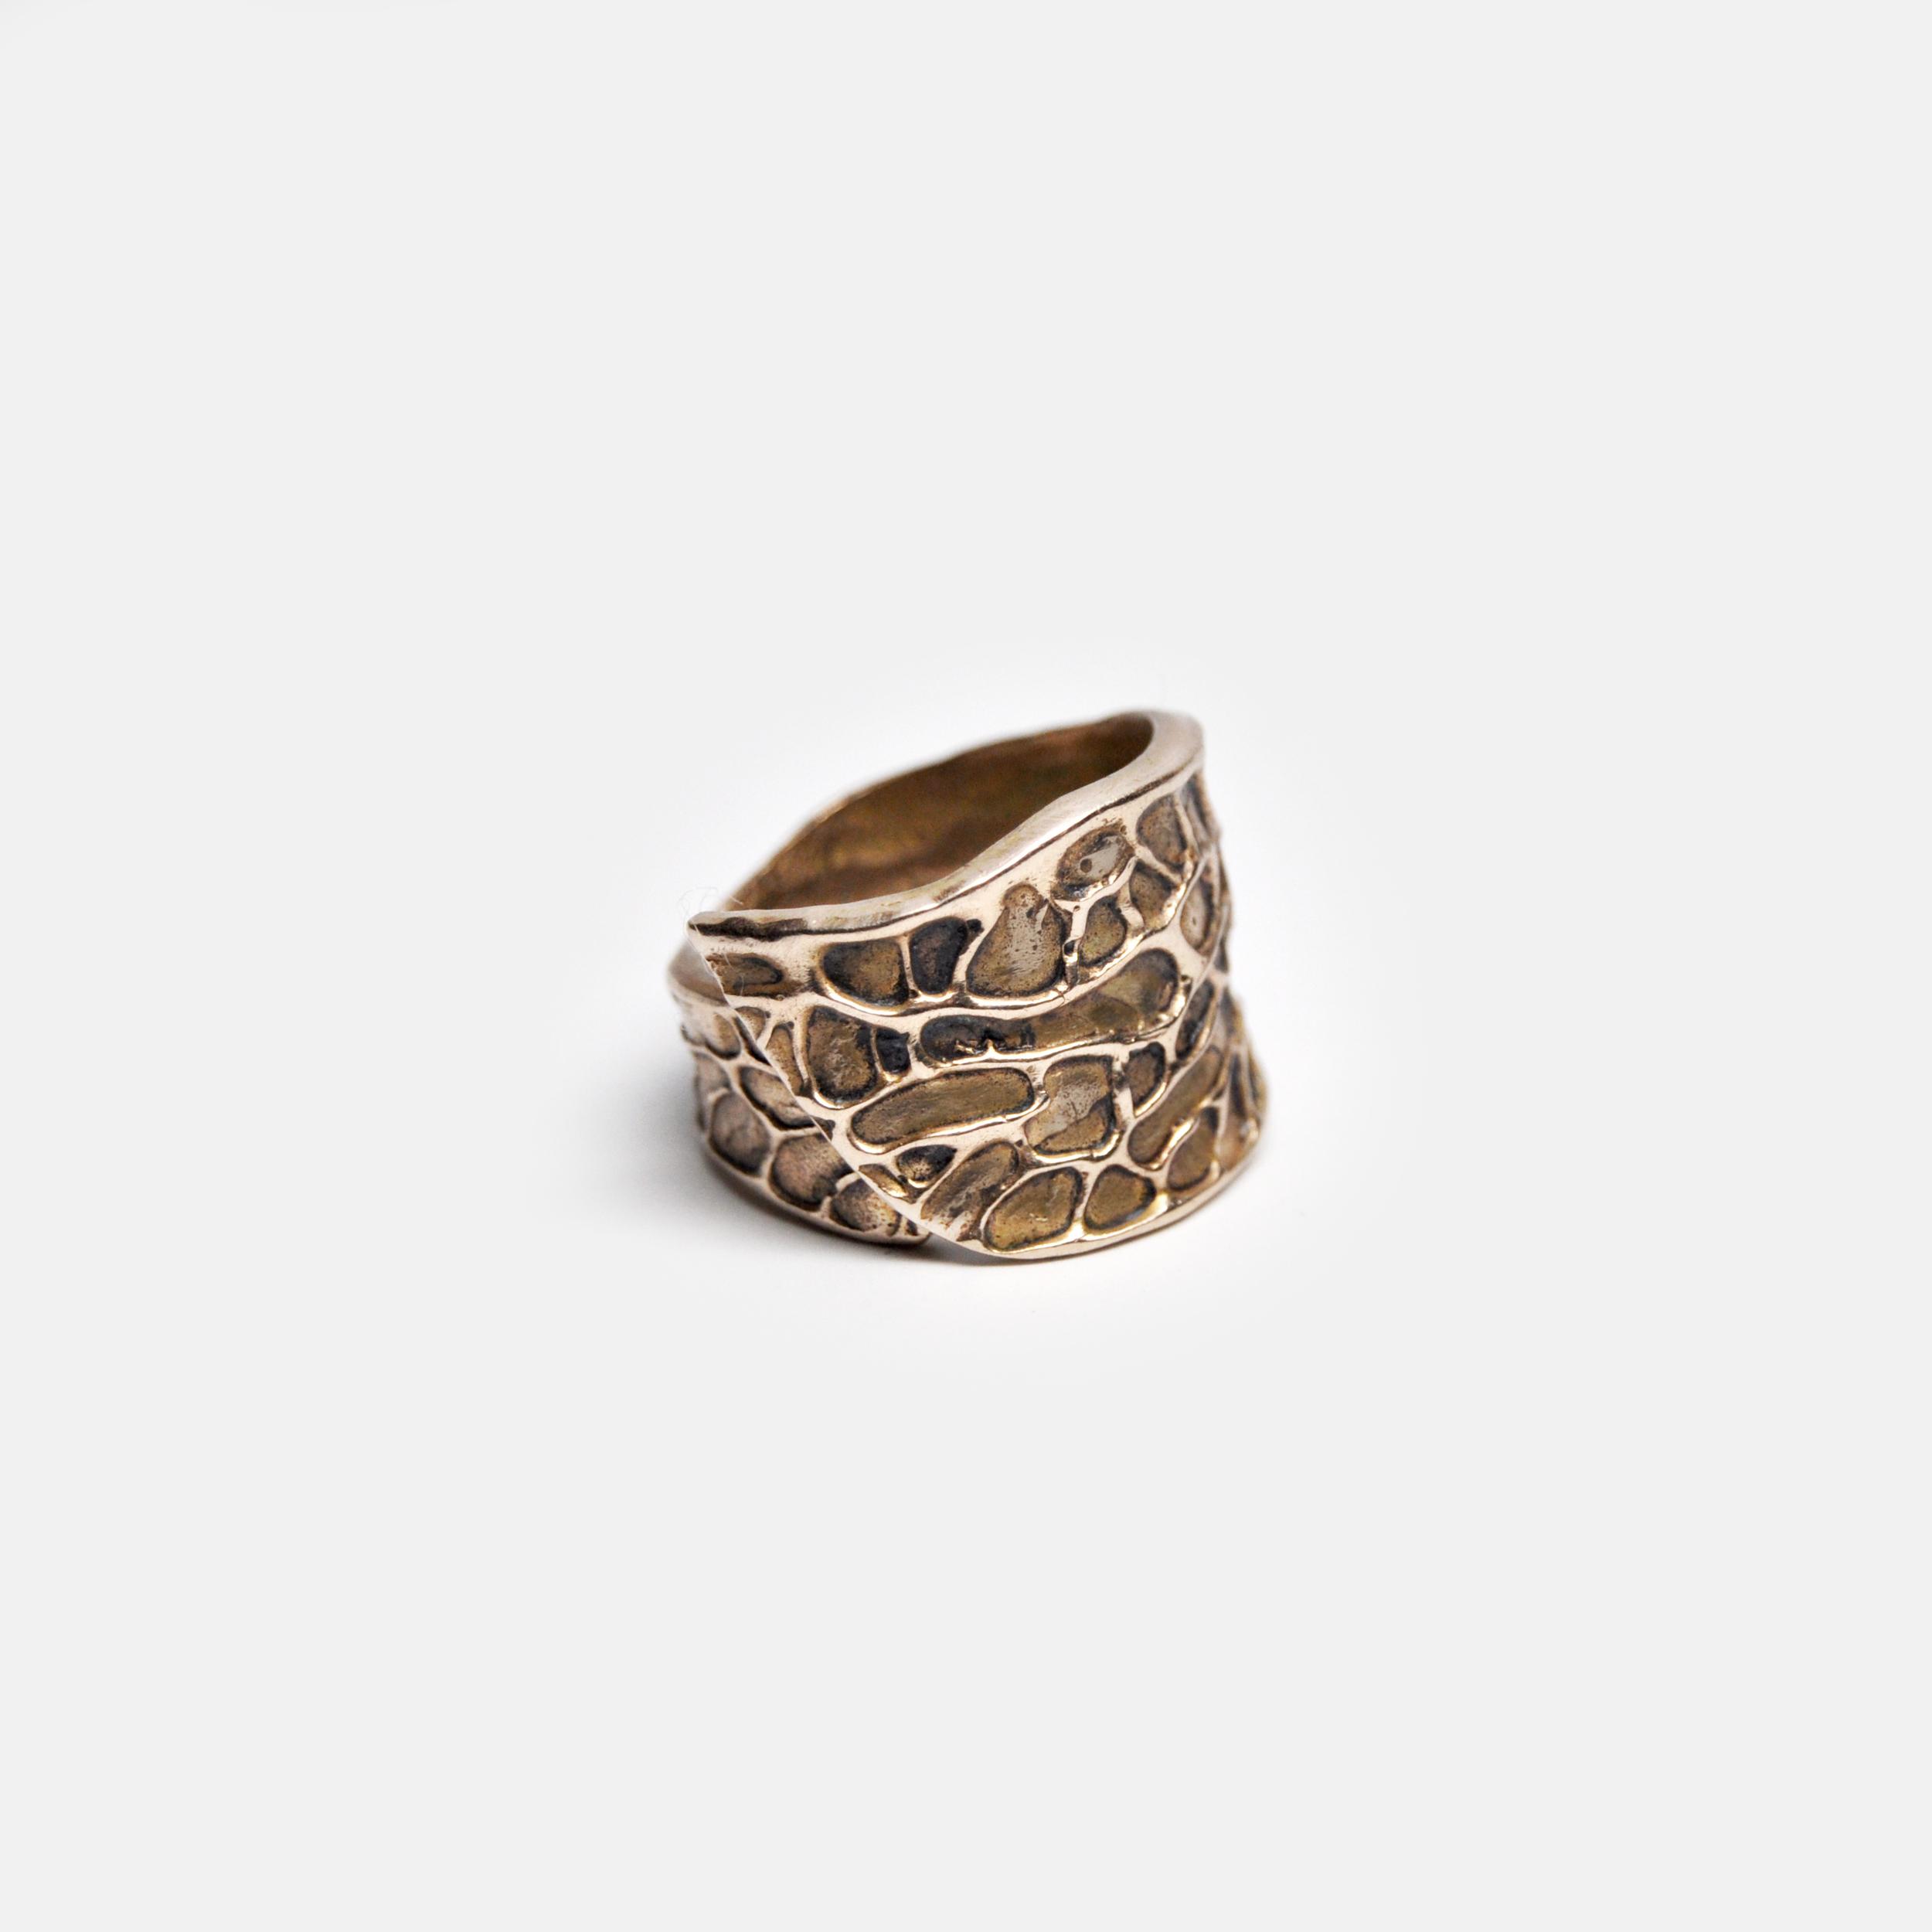 Marisa_Lomonaco_Hudson_Valley_custom_Jewelry_lathe_0001_Coral_Lace_Ring_Bronze.jpg